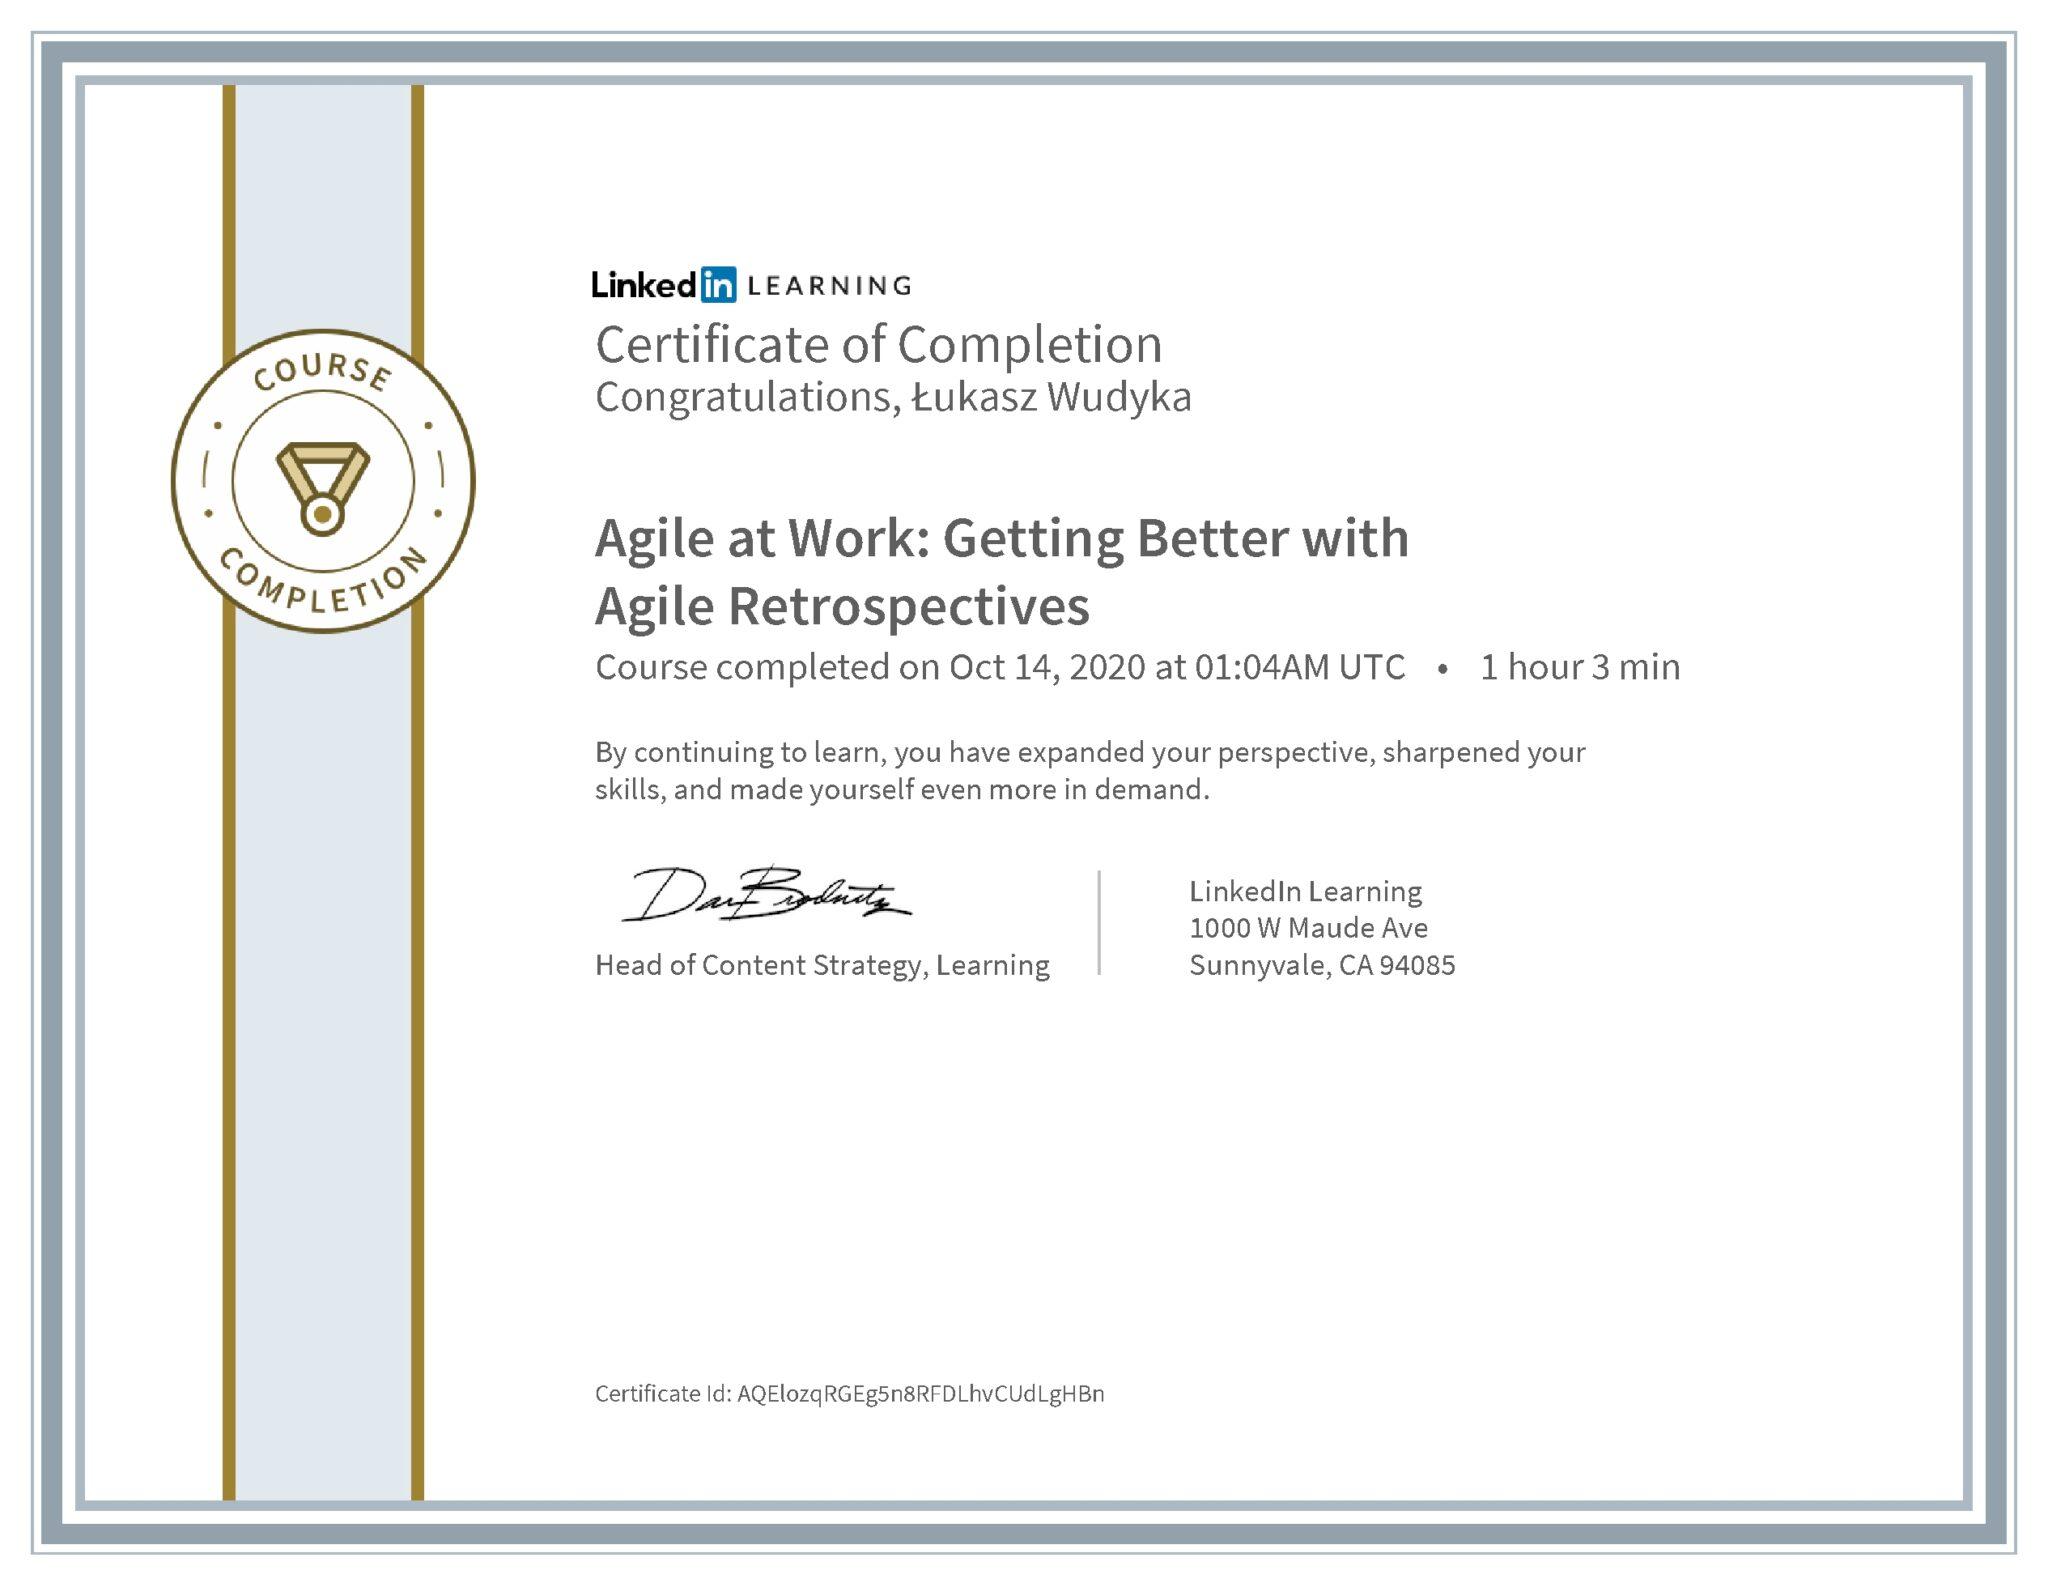 Łukasz Wudyka certyfikat LinkedIn Agile at Work: Getting Better with Agile Retrospectives